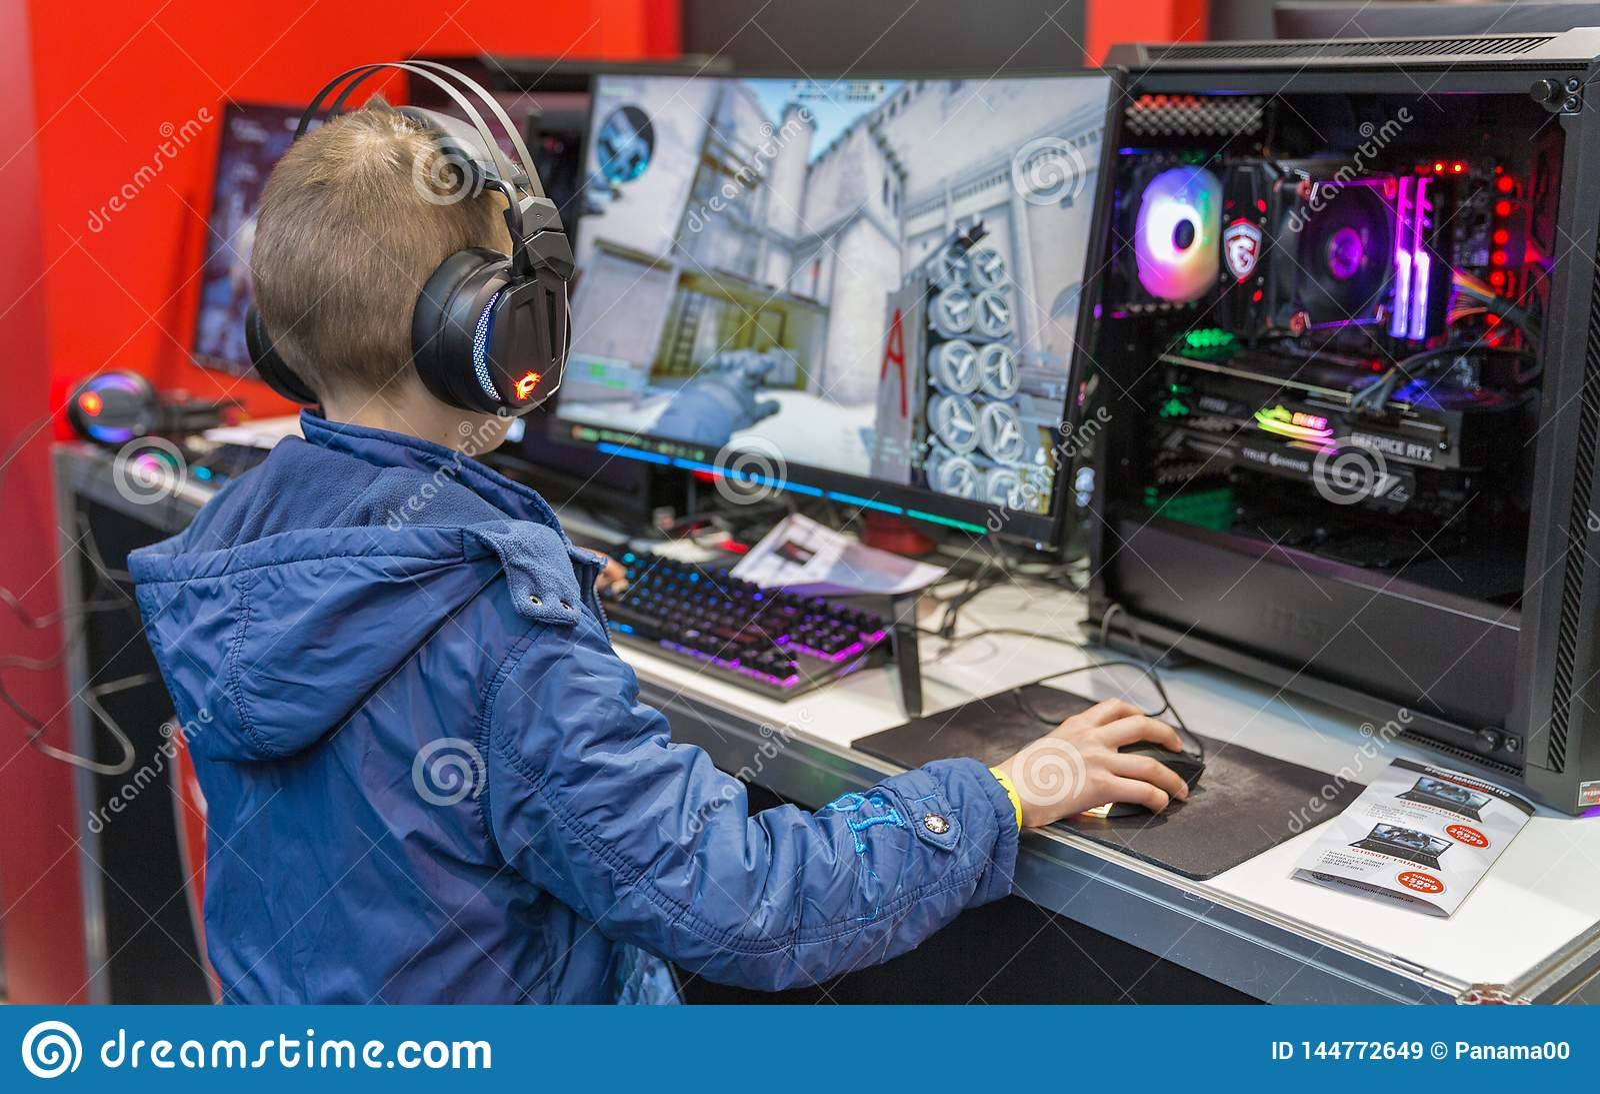 Boy Visit MSI Booth During CEE 2019 In Kyiv Ukraine